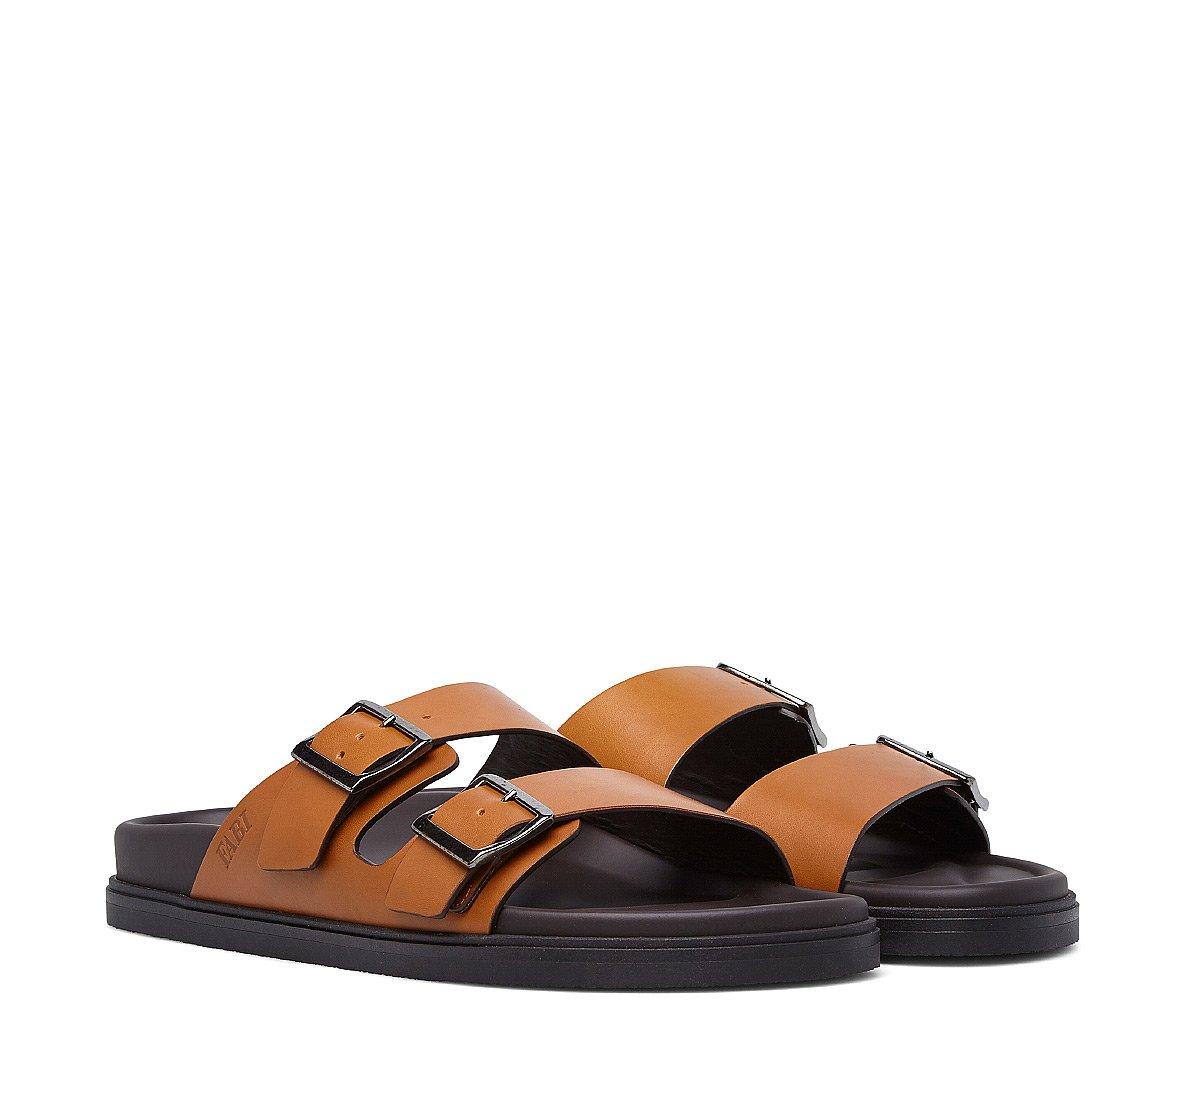 Soft calfskin sandal with double buckle